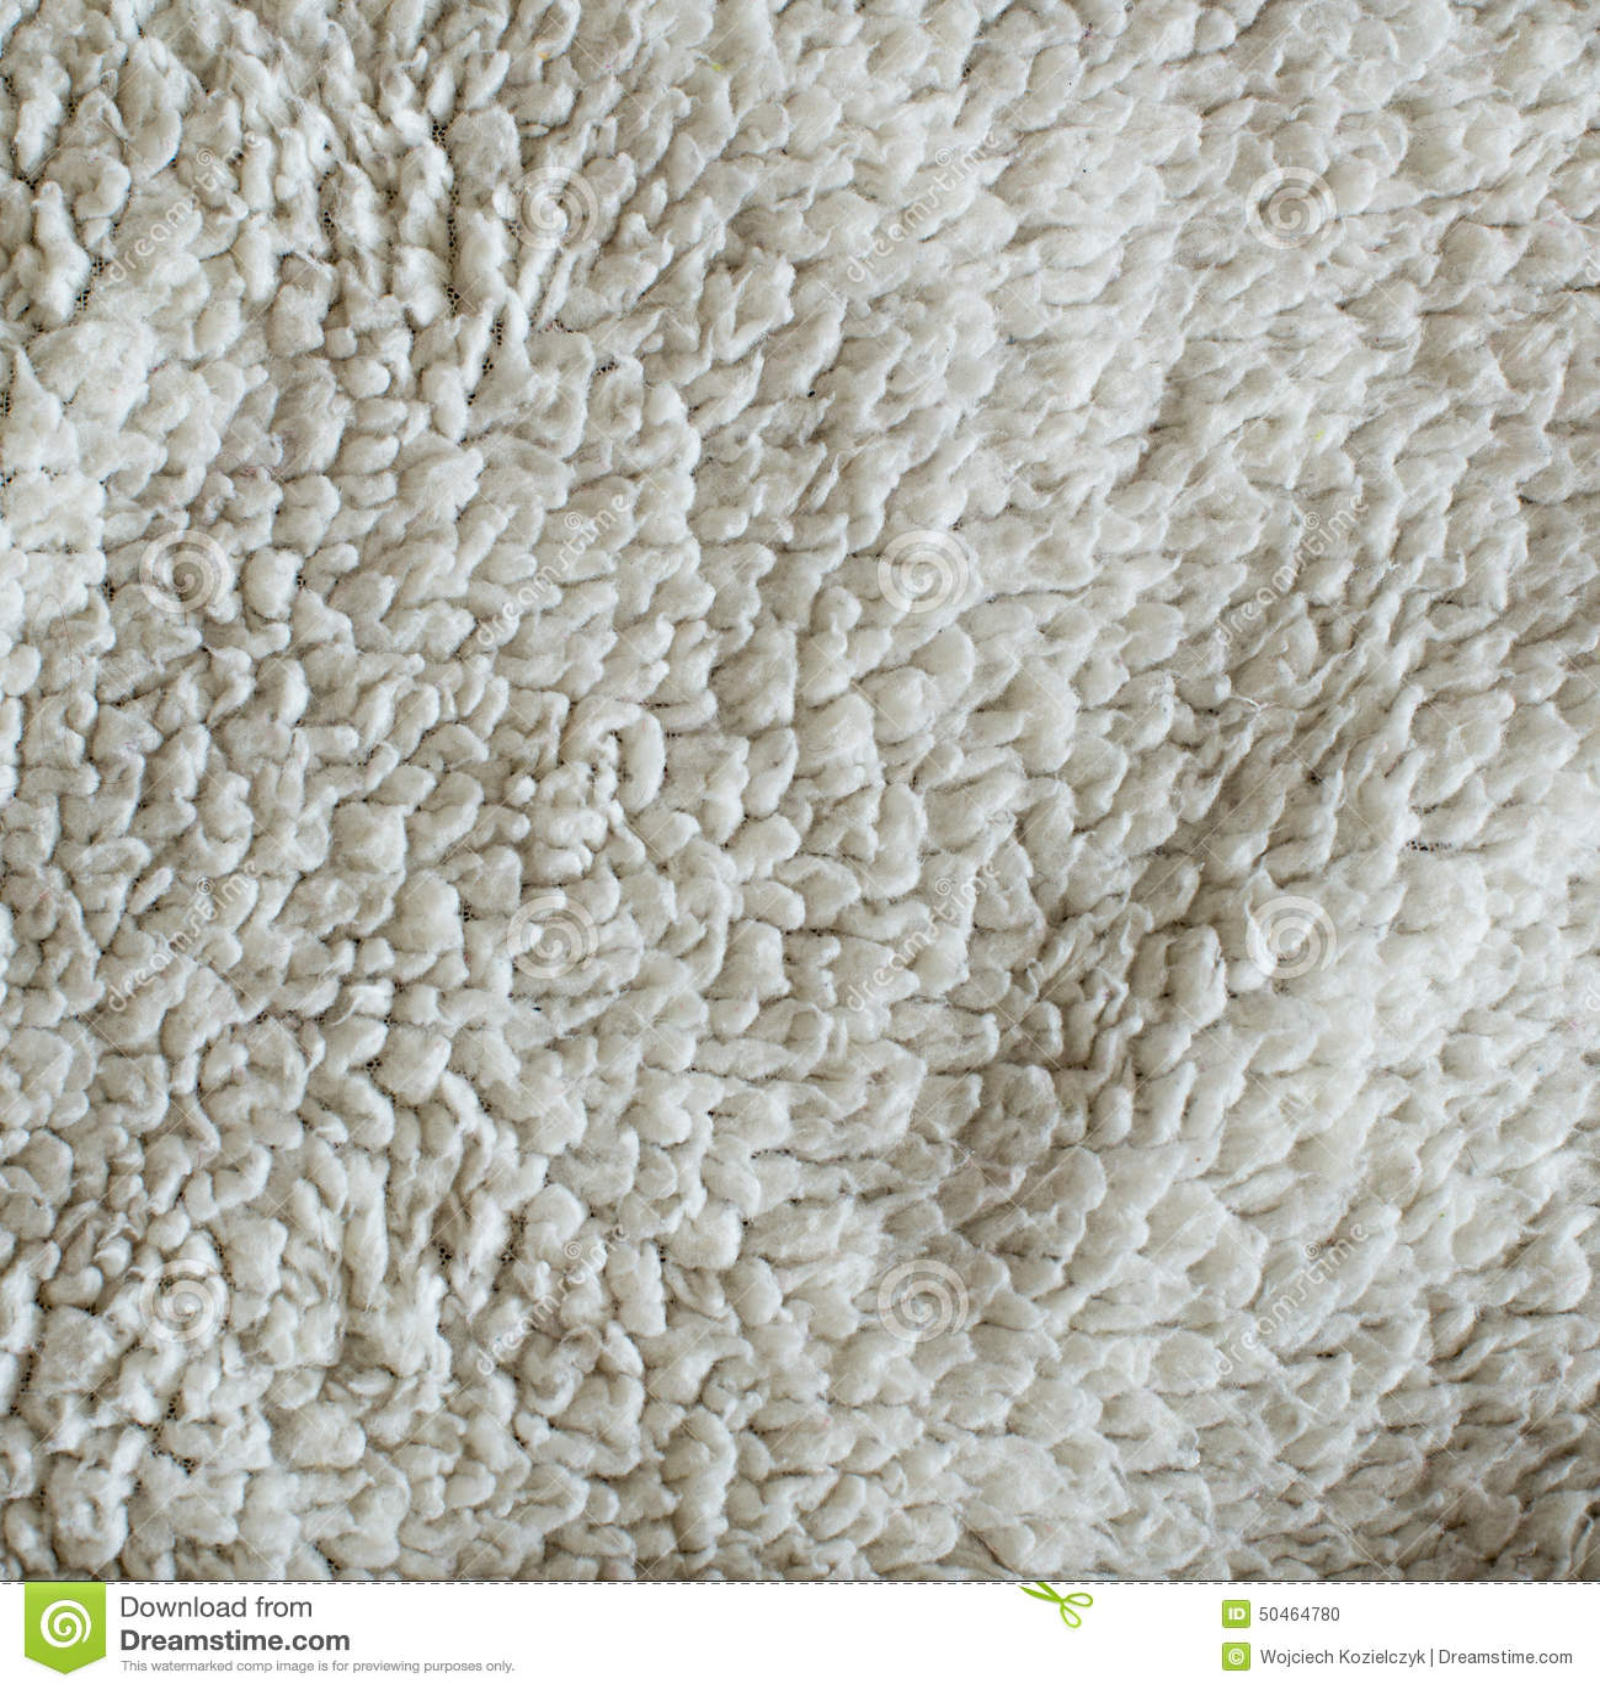 White Plush Blanket Texture Stock Photo Image of sheep fluff